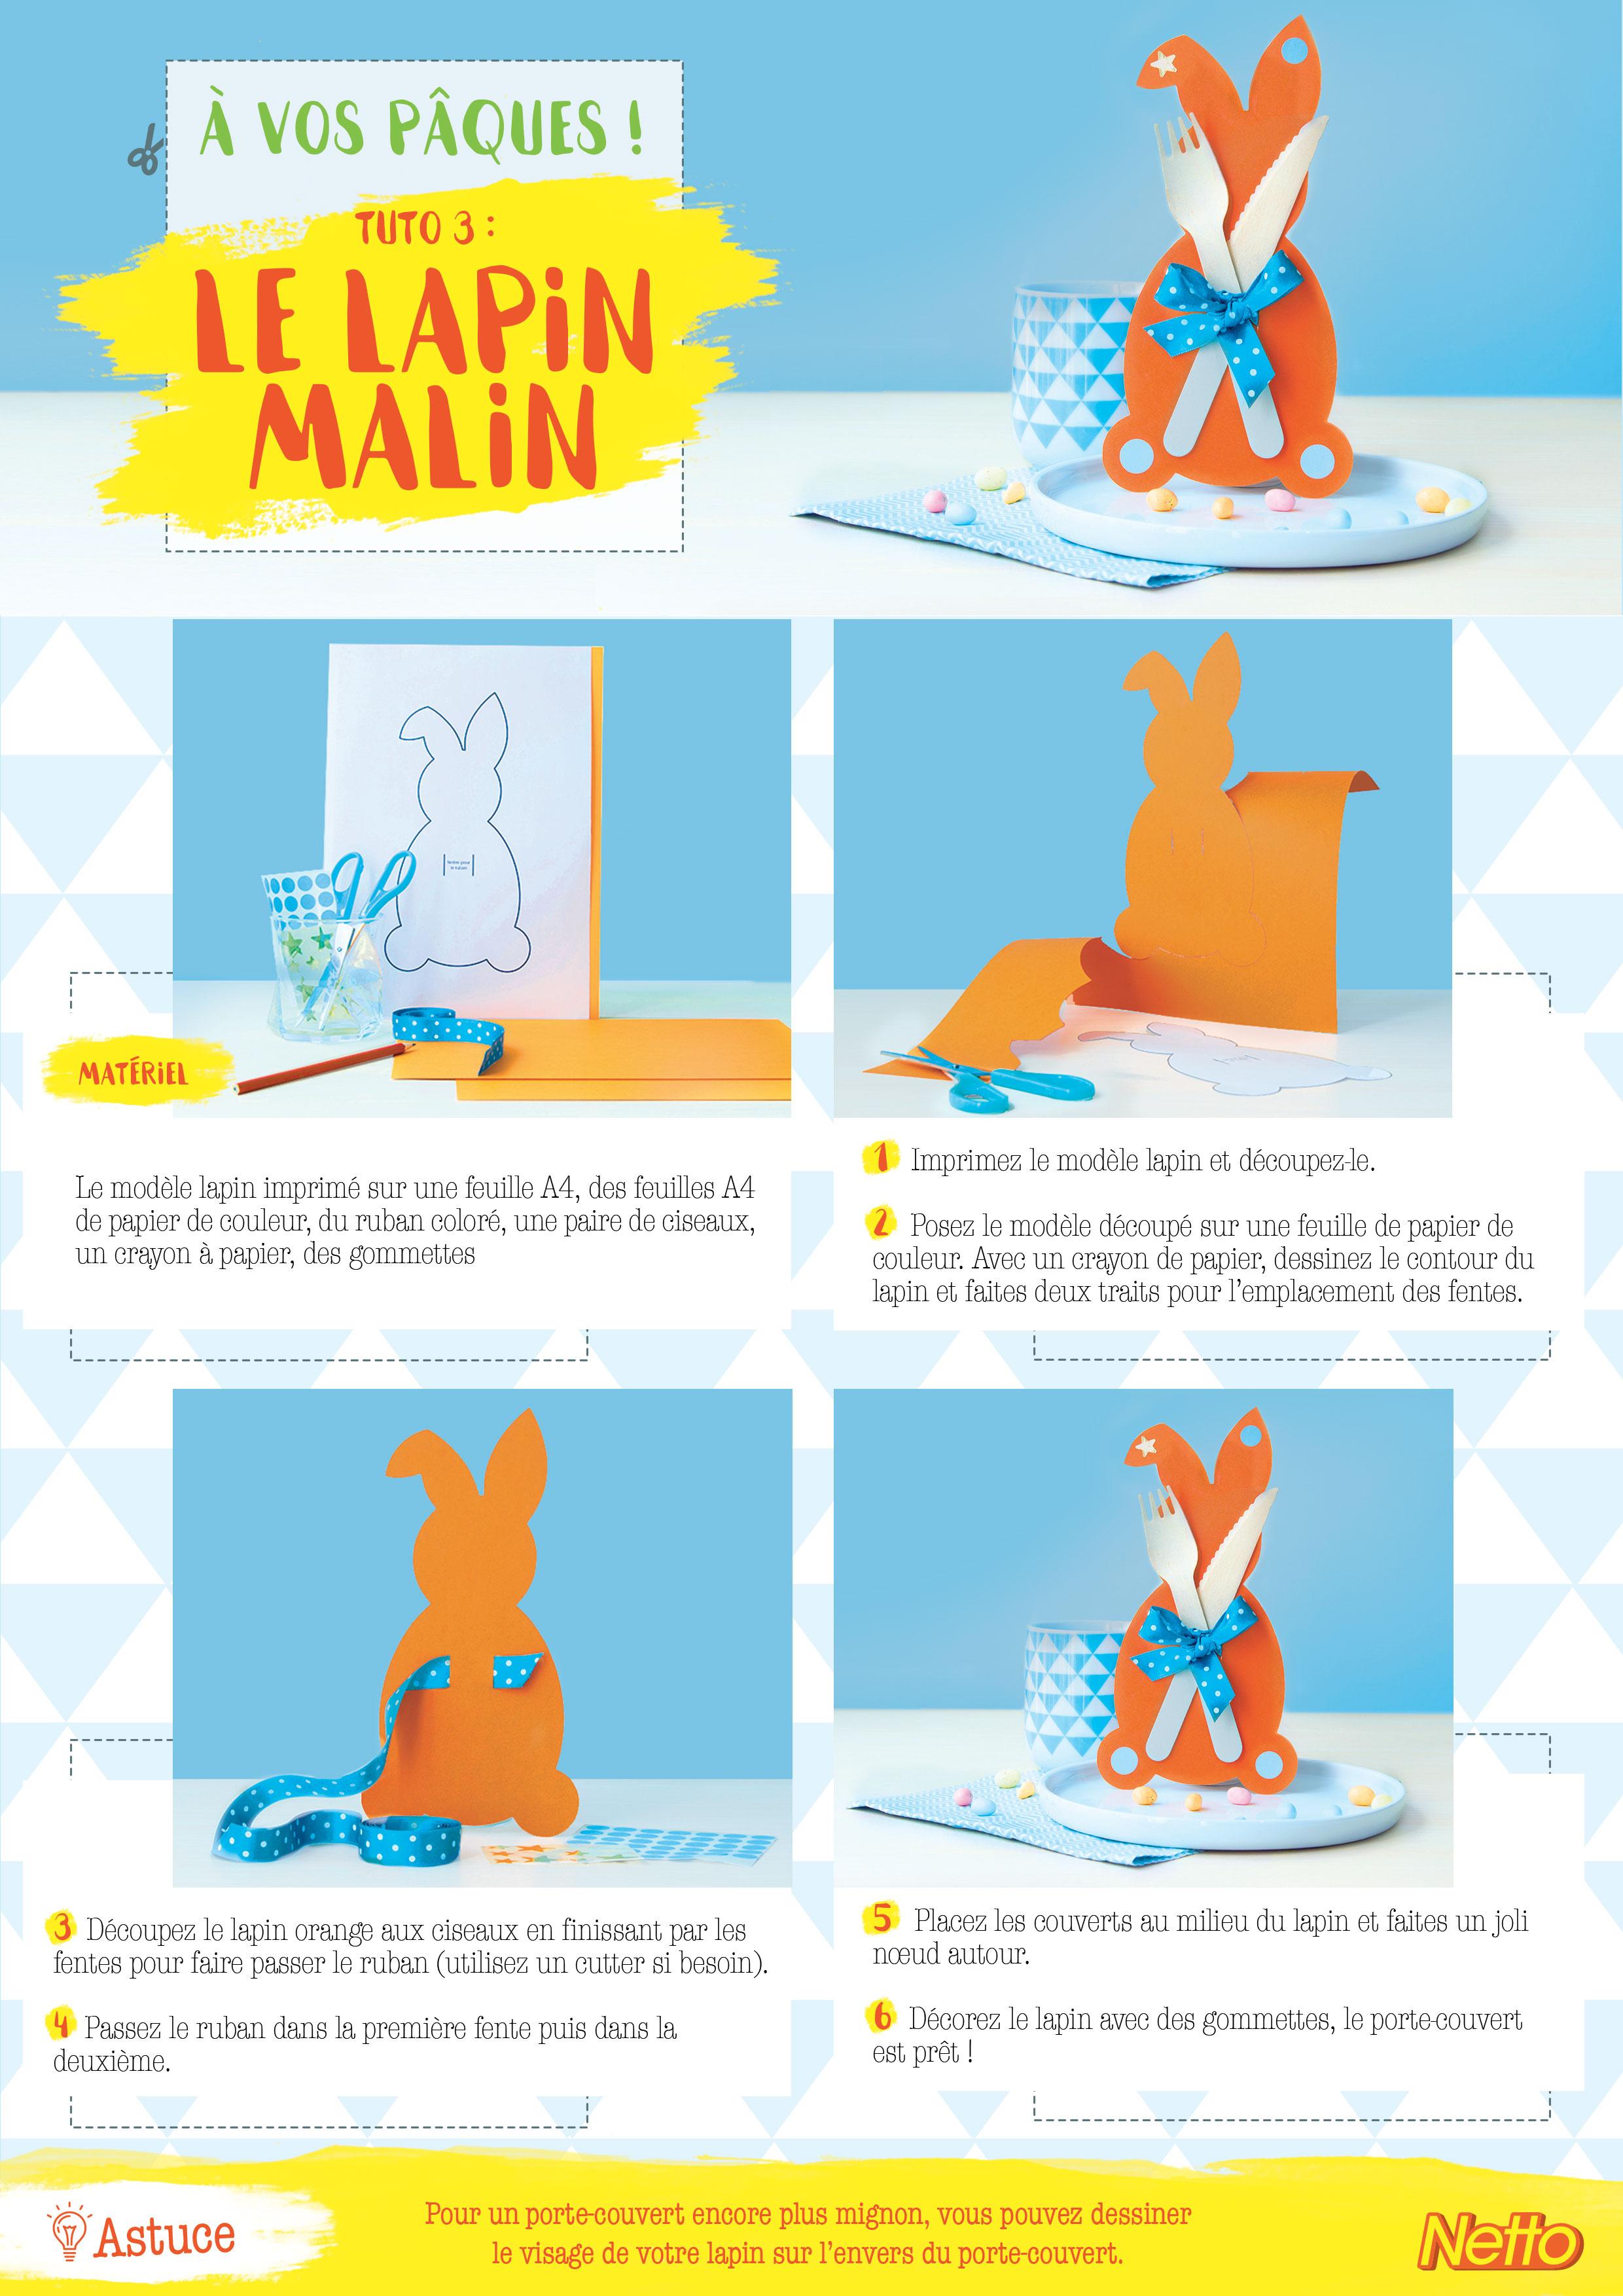 Tuto 3 : Le lapin porte-couvert